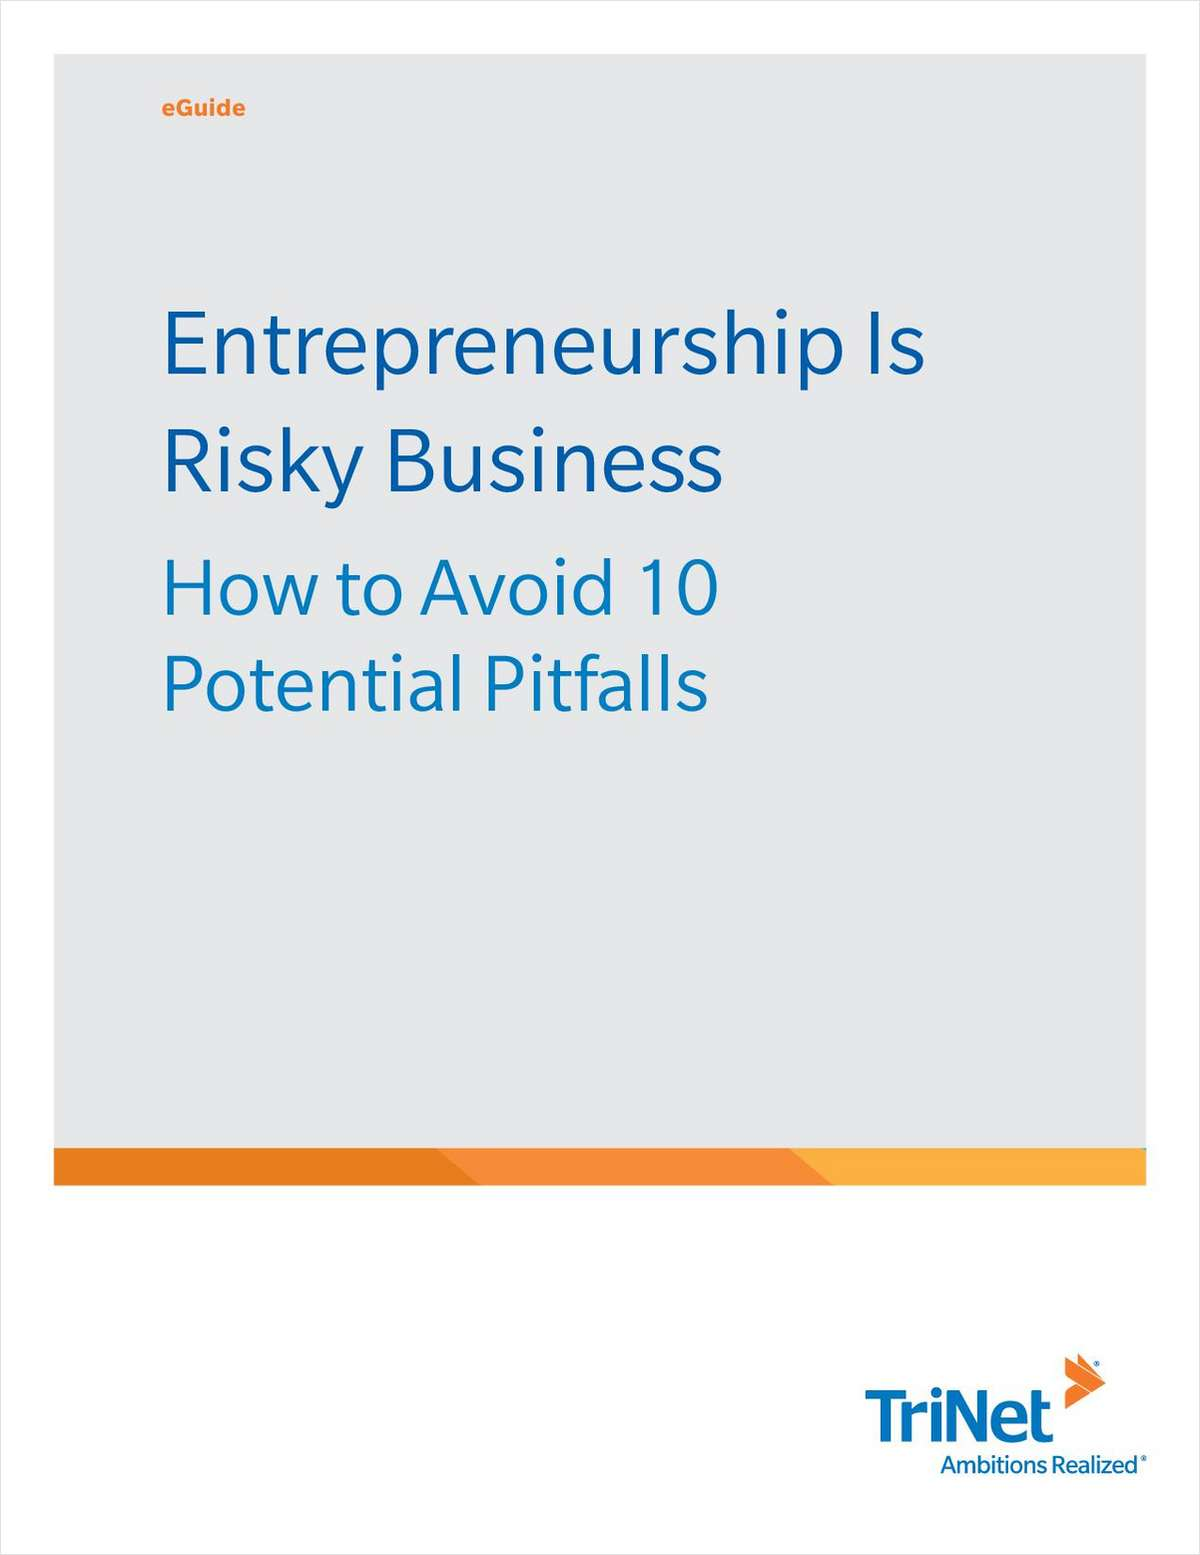 Entrepreneurship is Risky Business: How to Avoid 10 Potential Pitfalls